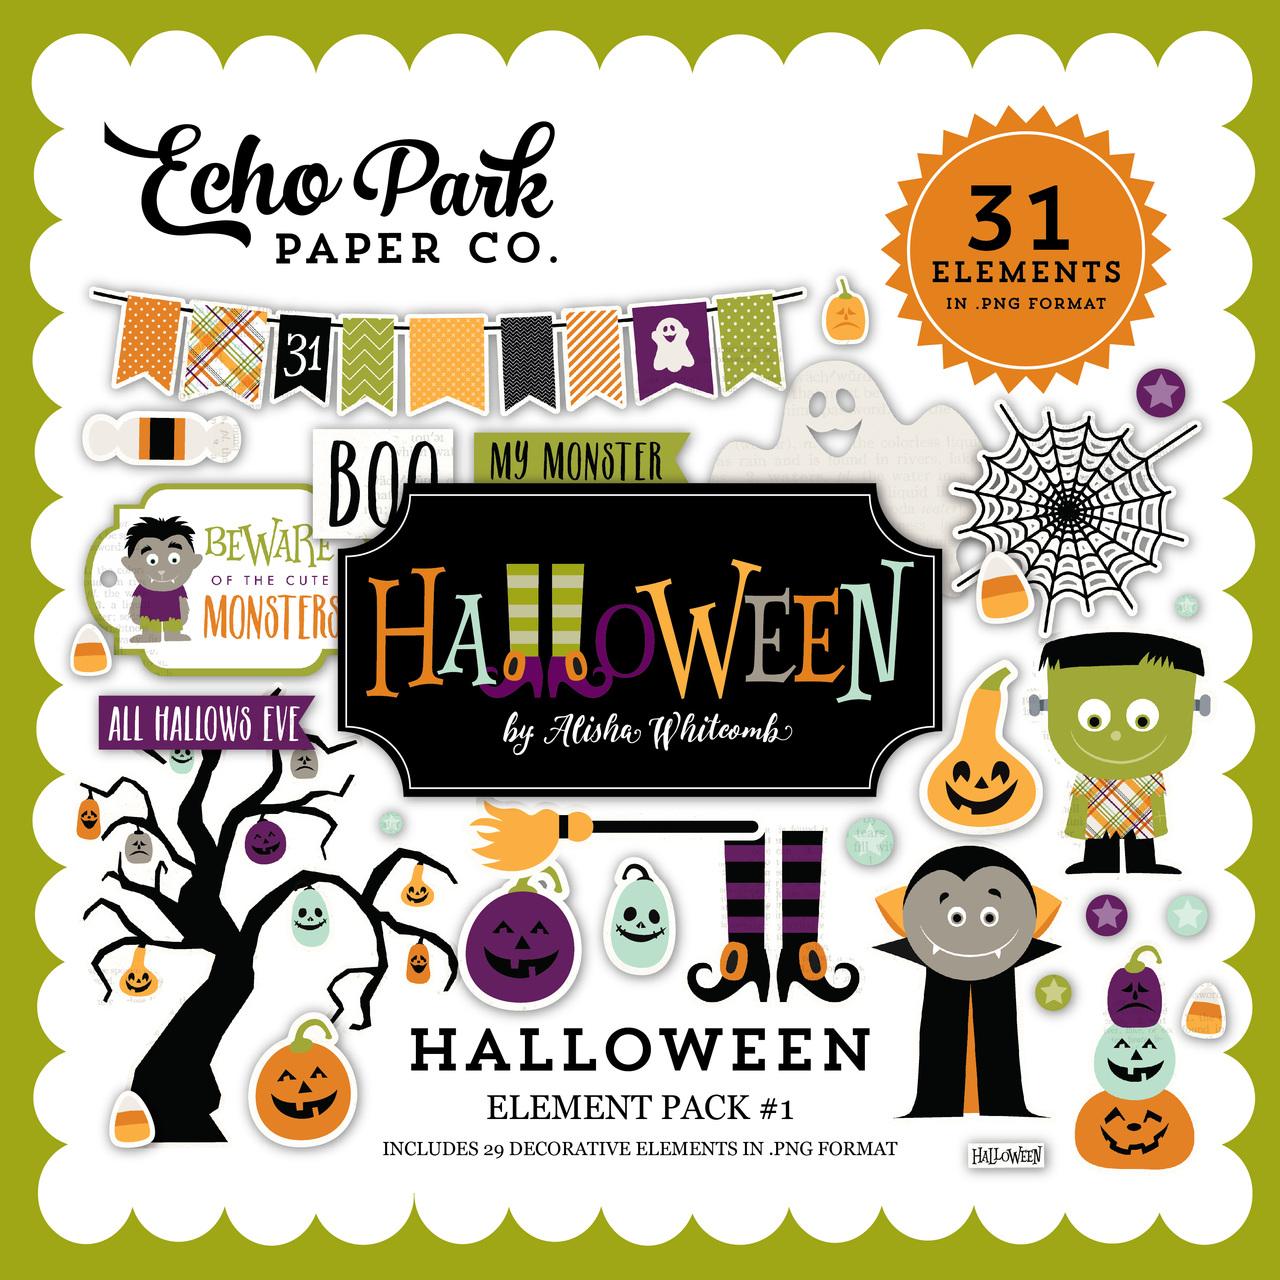 Halloween Element Pack #1